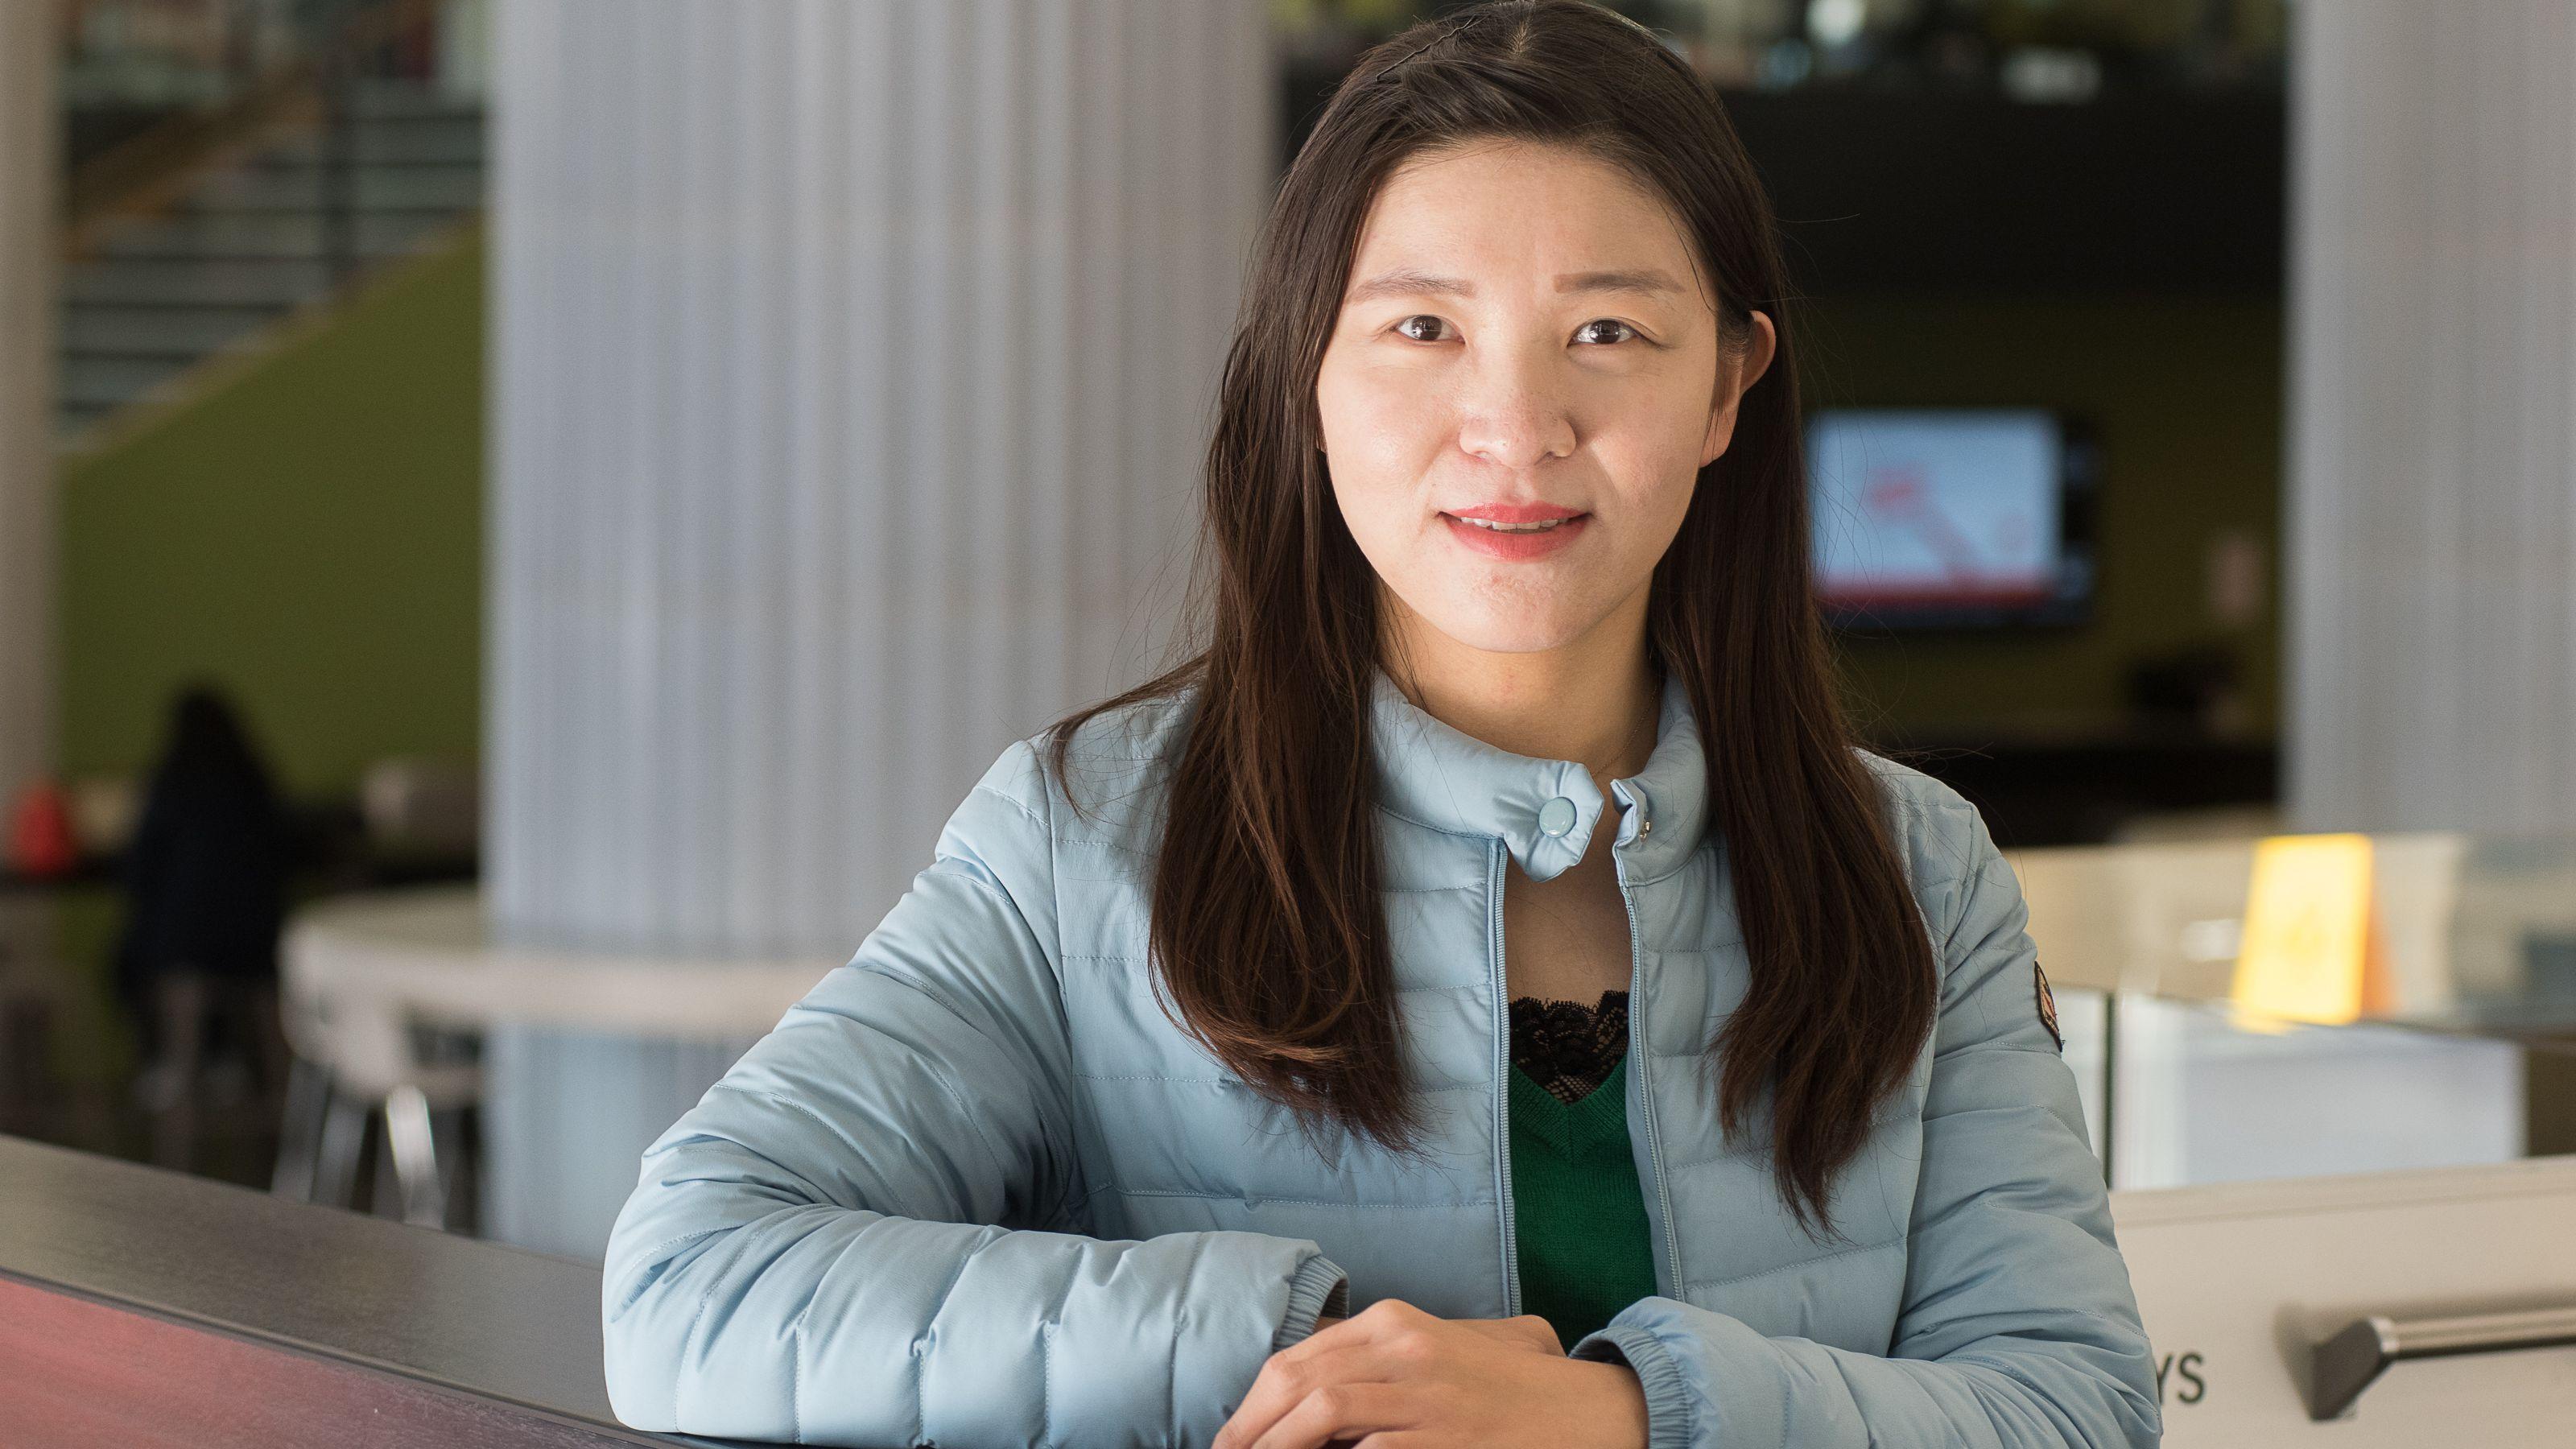 PhD candidate Cong Fan